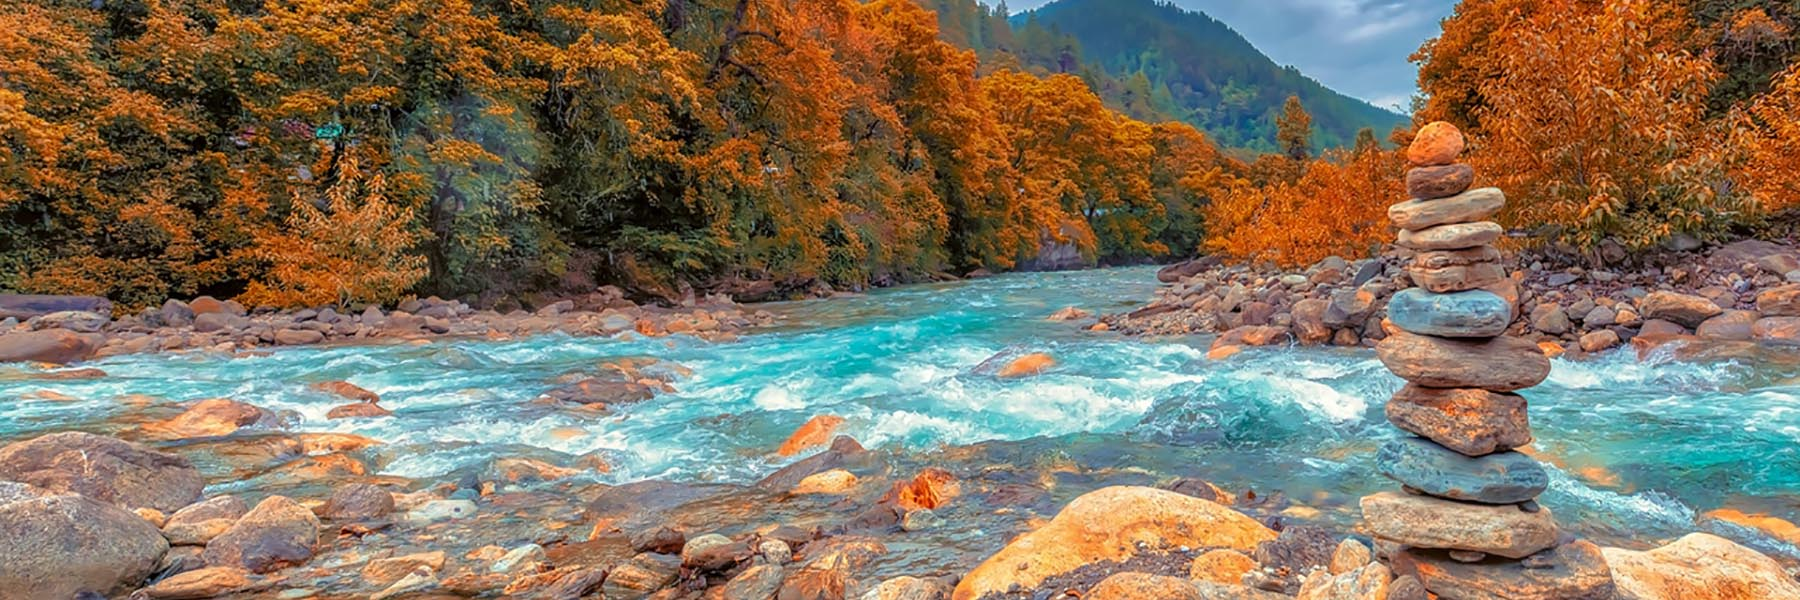 Happiness Bhutan Tour